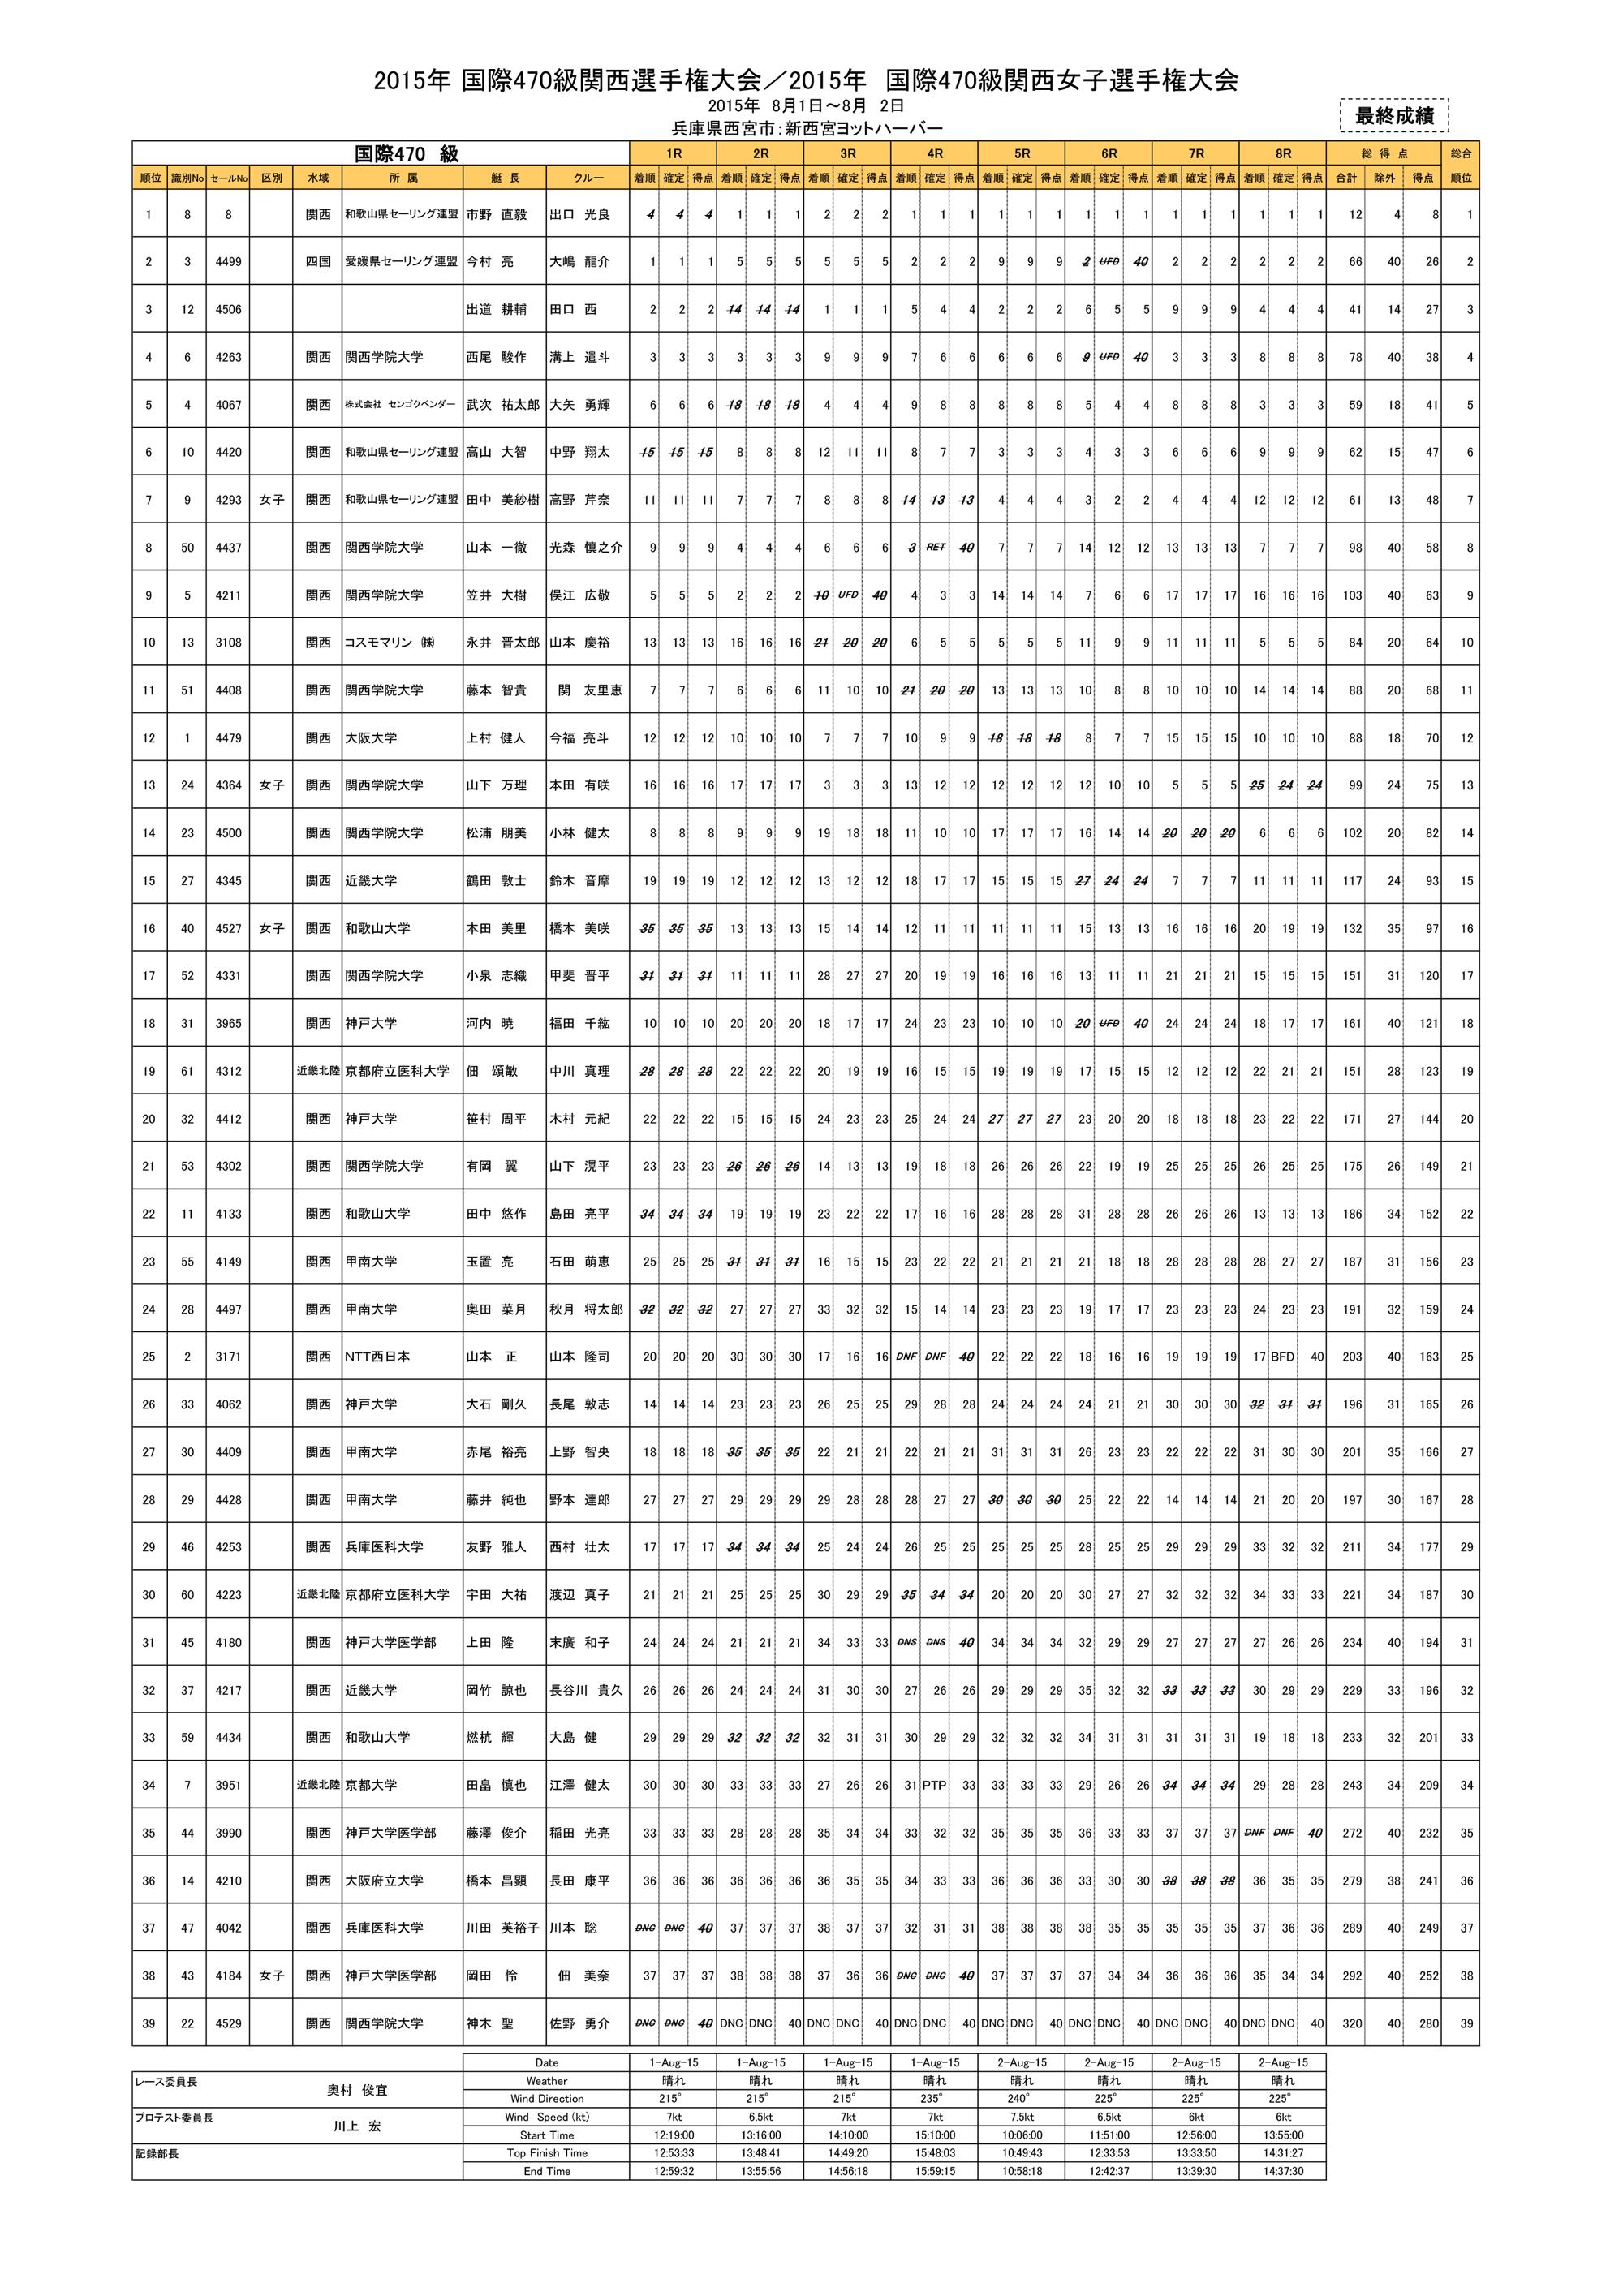 150802_result_470